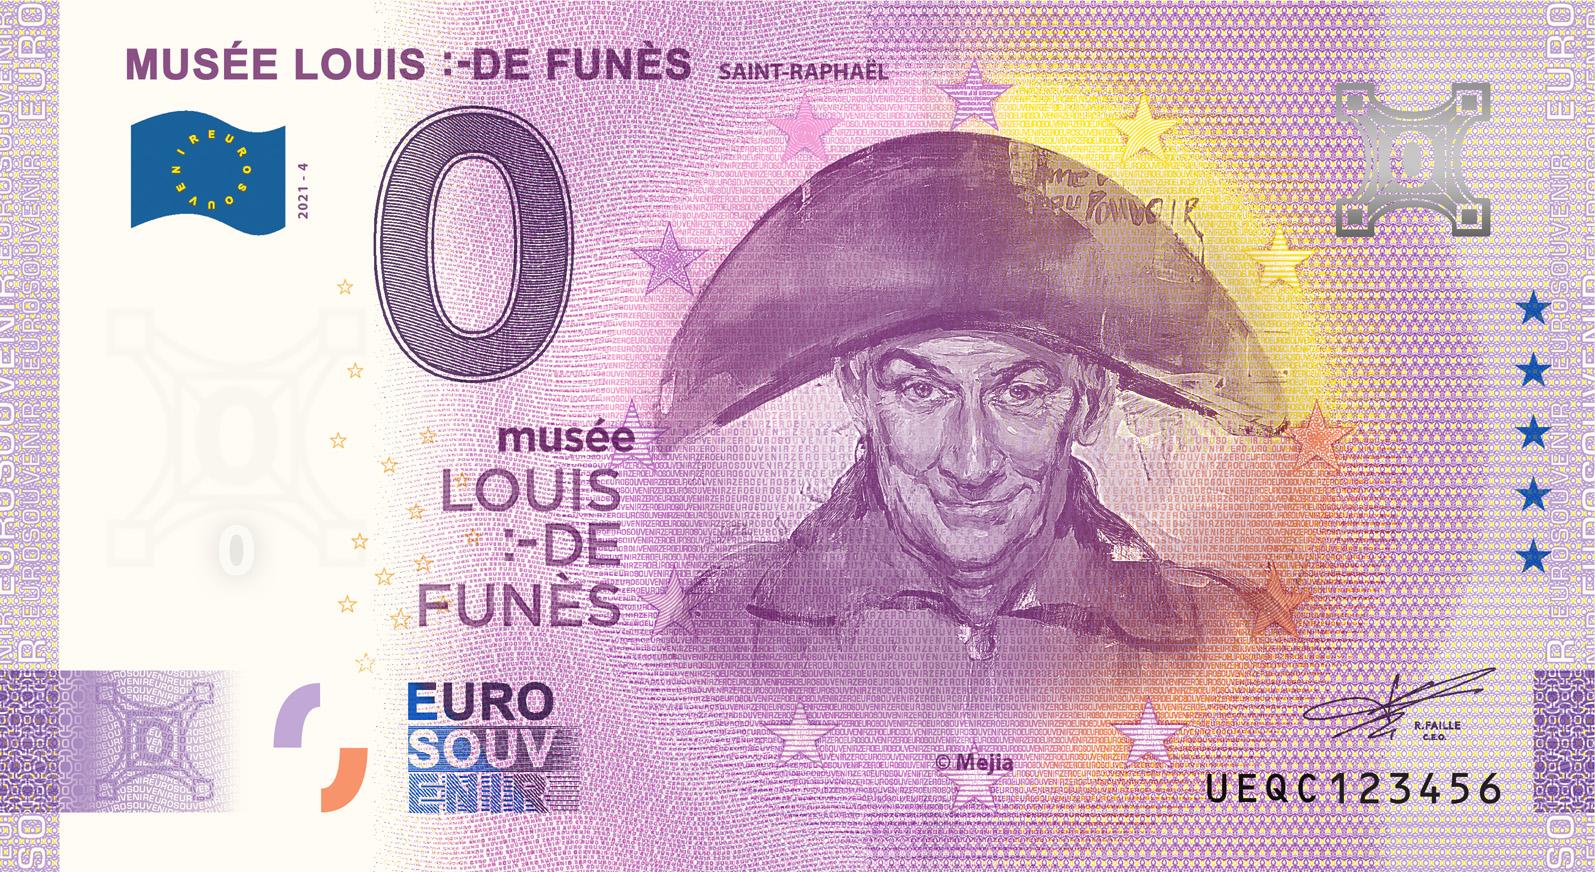 FRA_FRA_UEQC4_Musee_De_Funes_2021.jpg